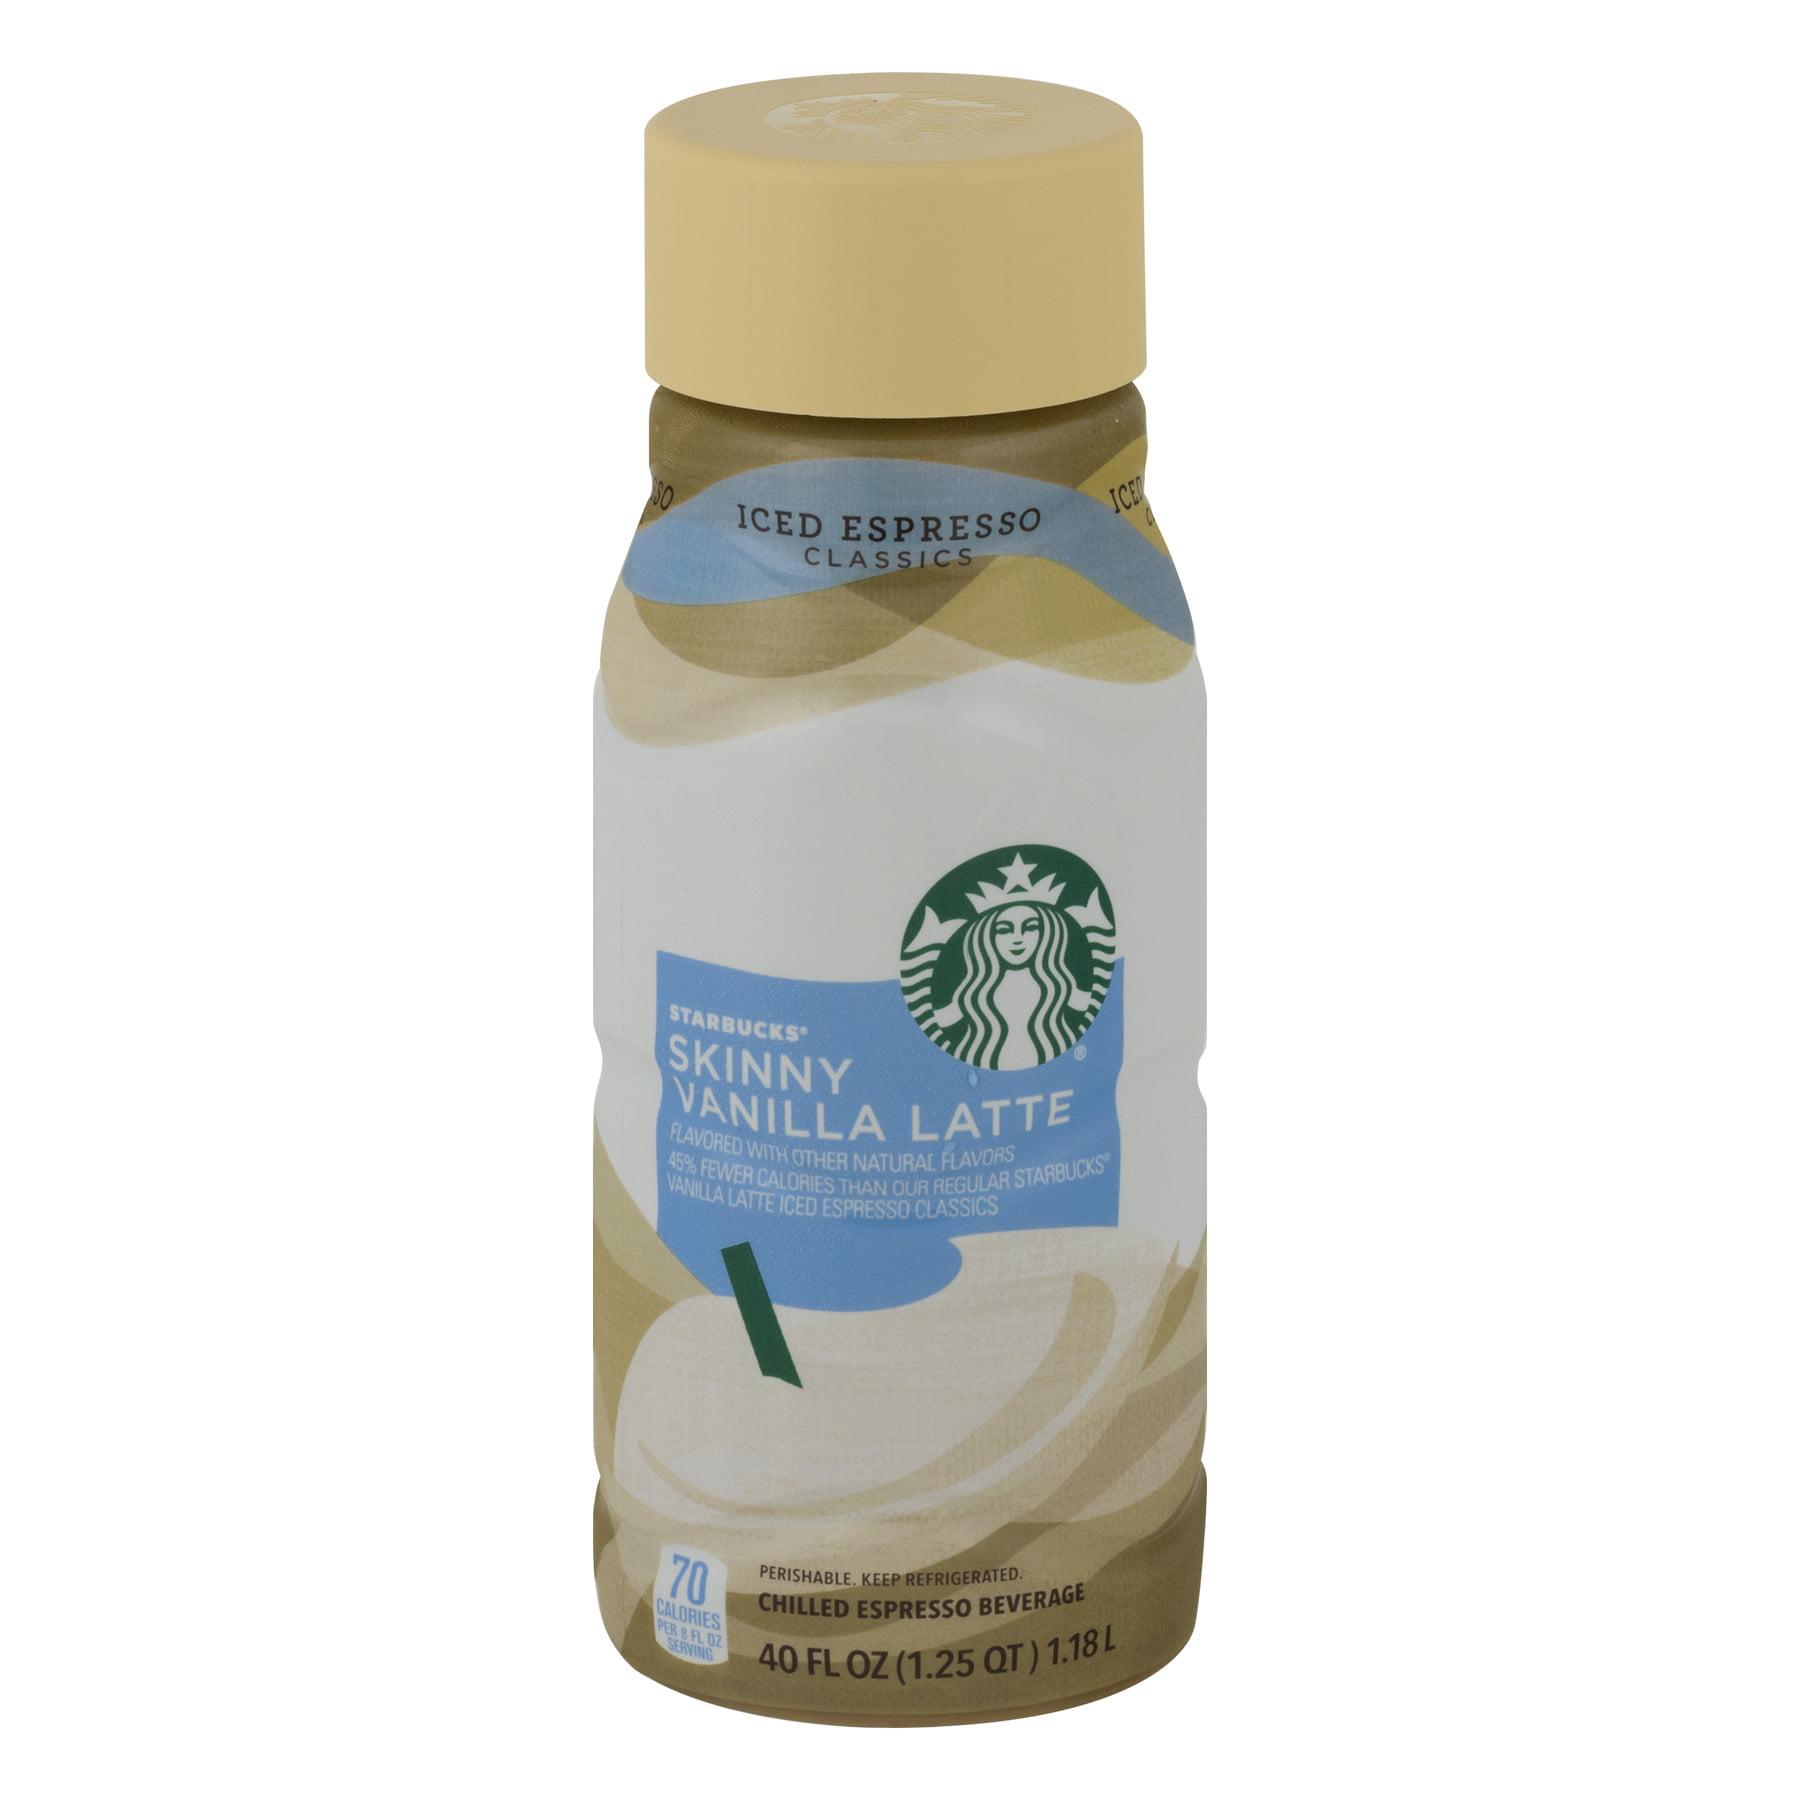 Starbucks Skinny Vanilla Latte Chilled Espresso Beverage 40